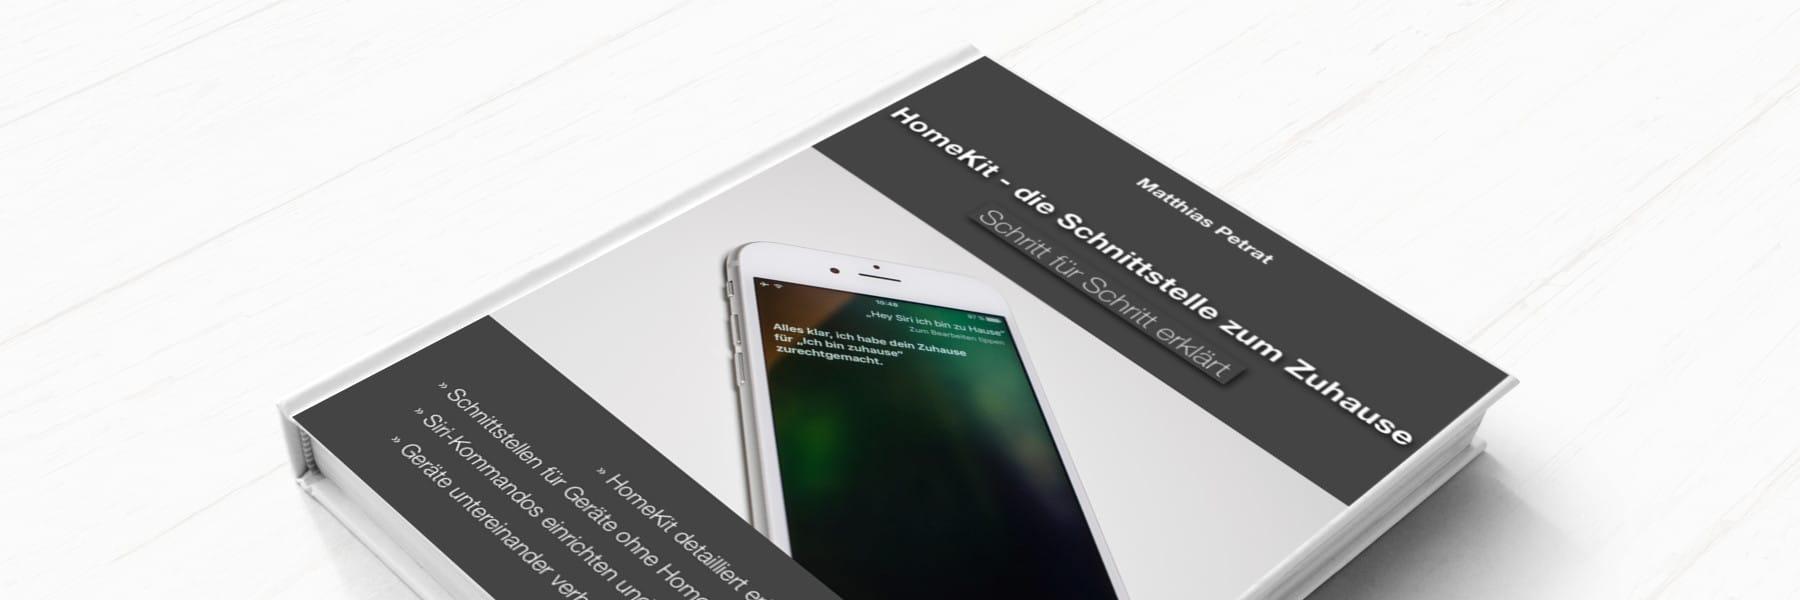 Ausführliche Homebridge Anleitung als E-Book